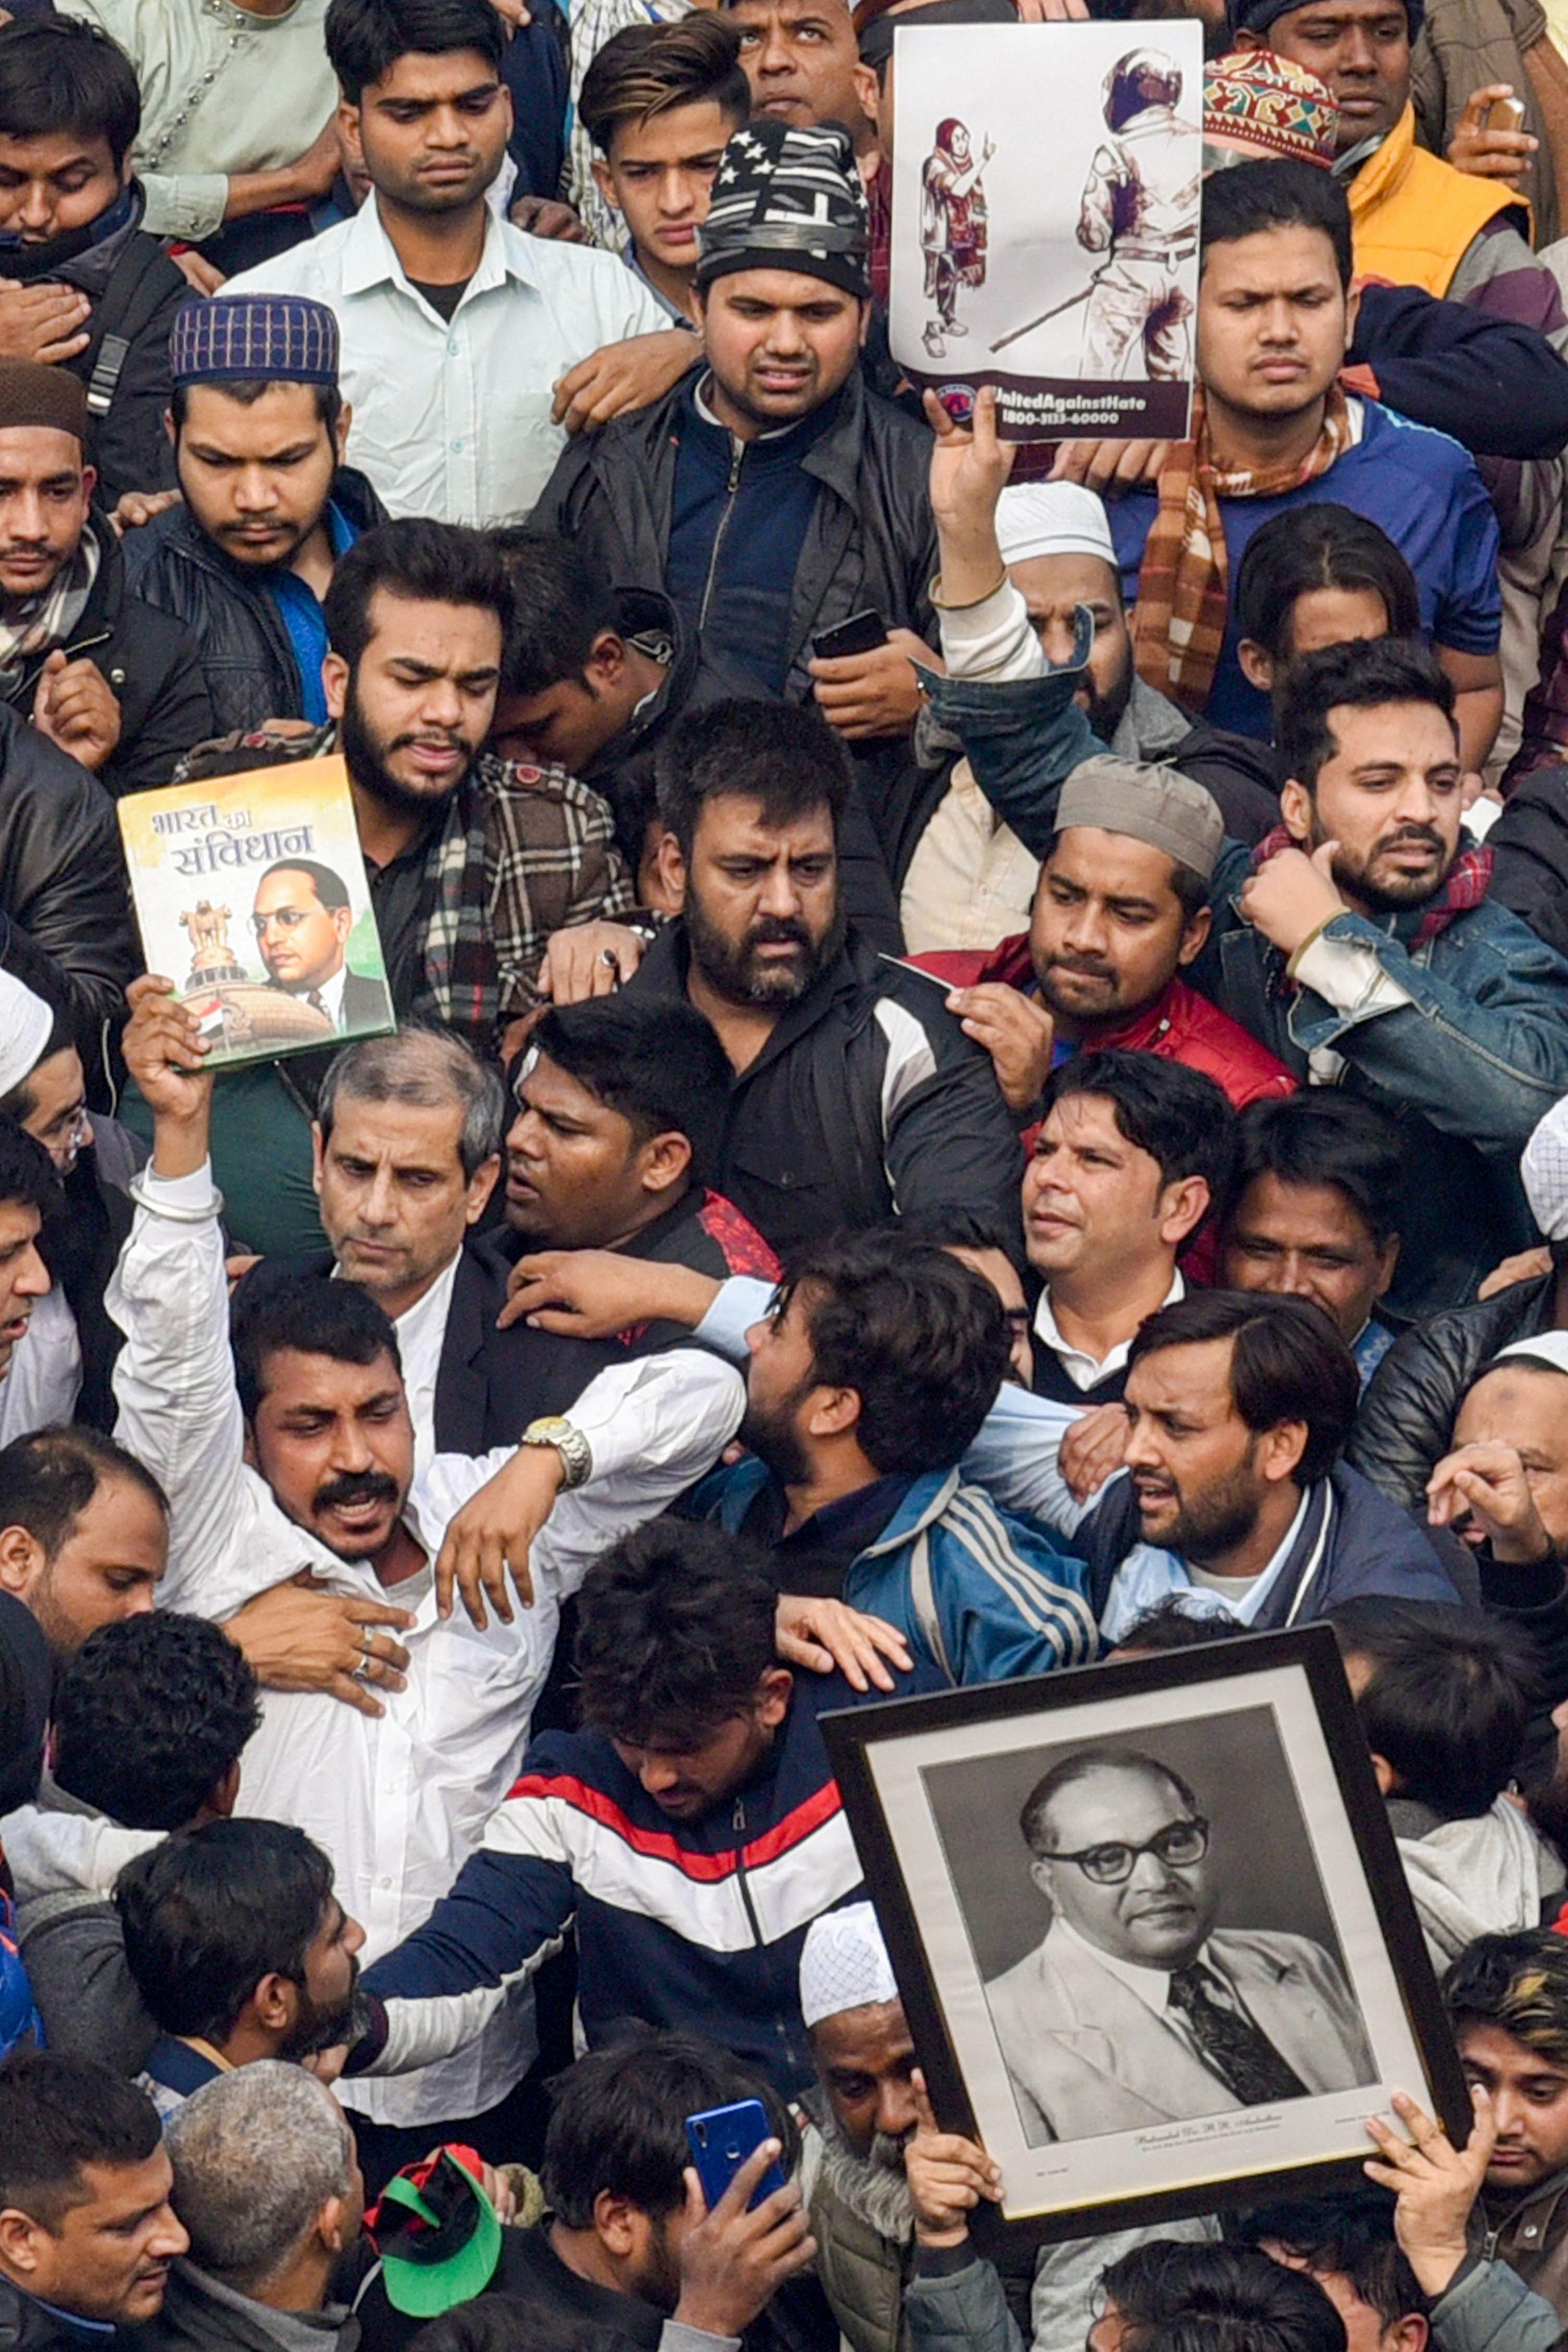 Bhim Army chief Chandrashekhar Azad raises slogans during a protest against Citizenship (Amendment) Act (CAA) at Jama Masjid in New Delhi, Friday, December 20, 2019.